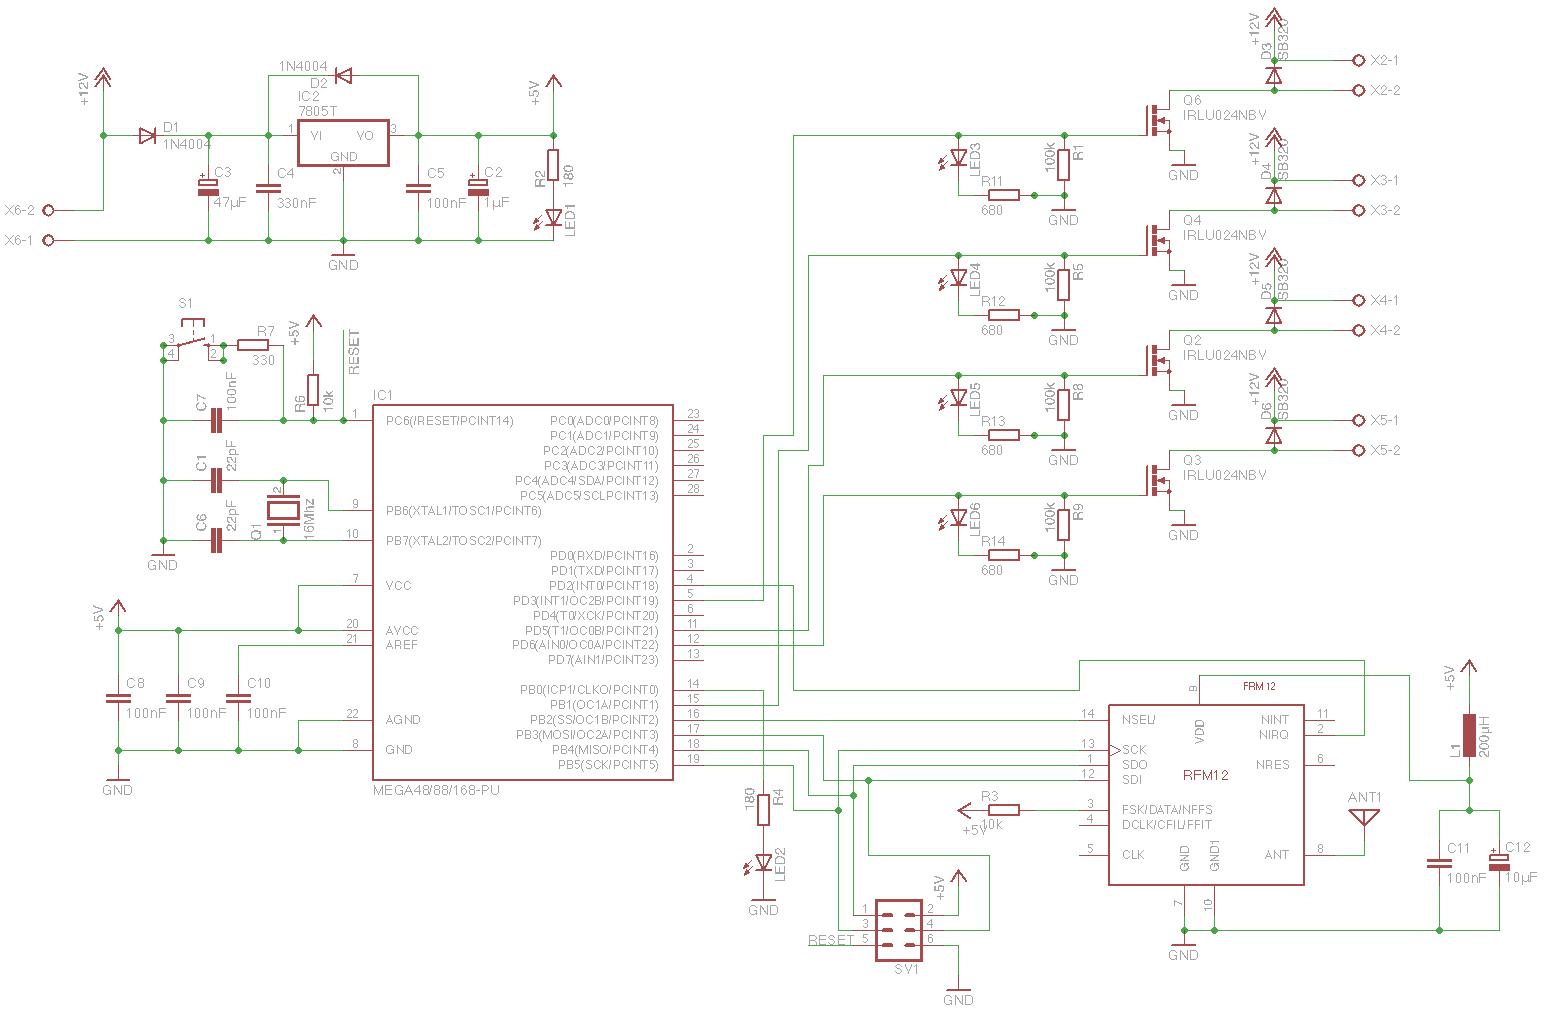 Feedback Schaltplan und Boardlayout - Mikrocontroller.net